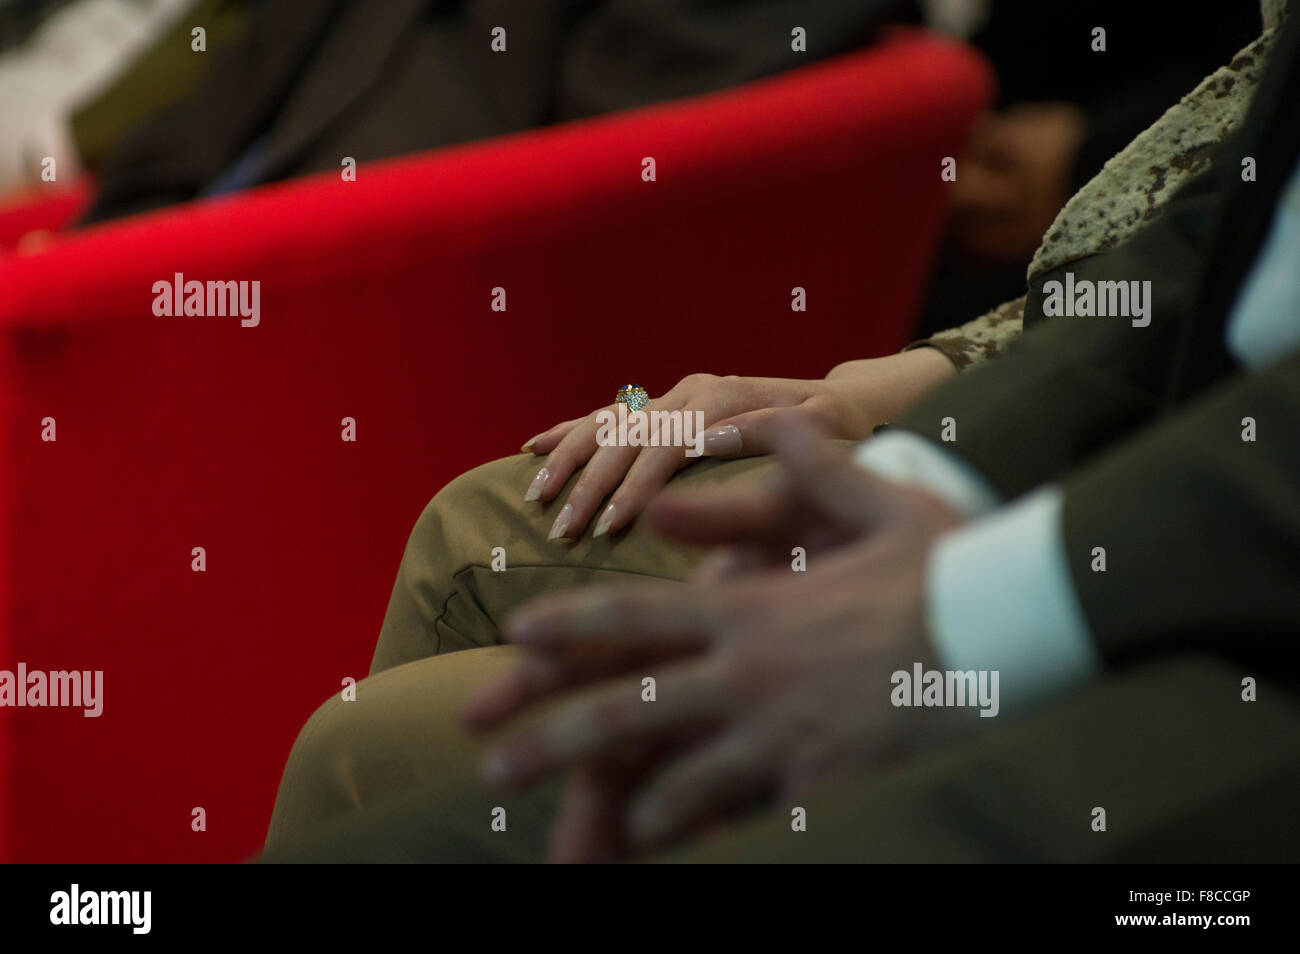 Long Fingernails Stockfotos & Long Fingernails Bilder - Alamy